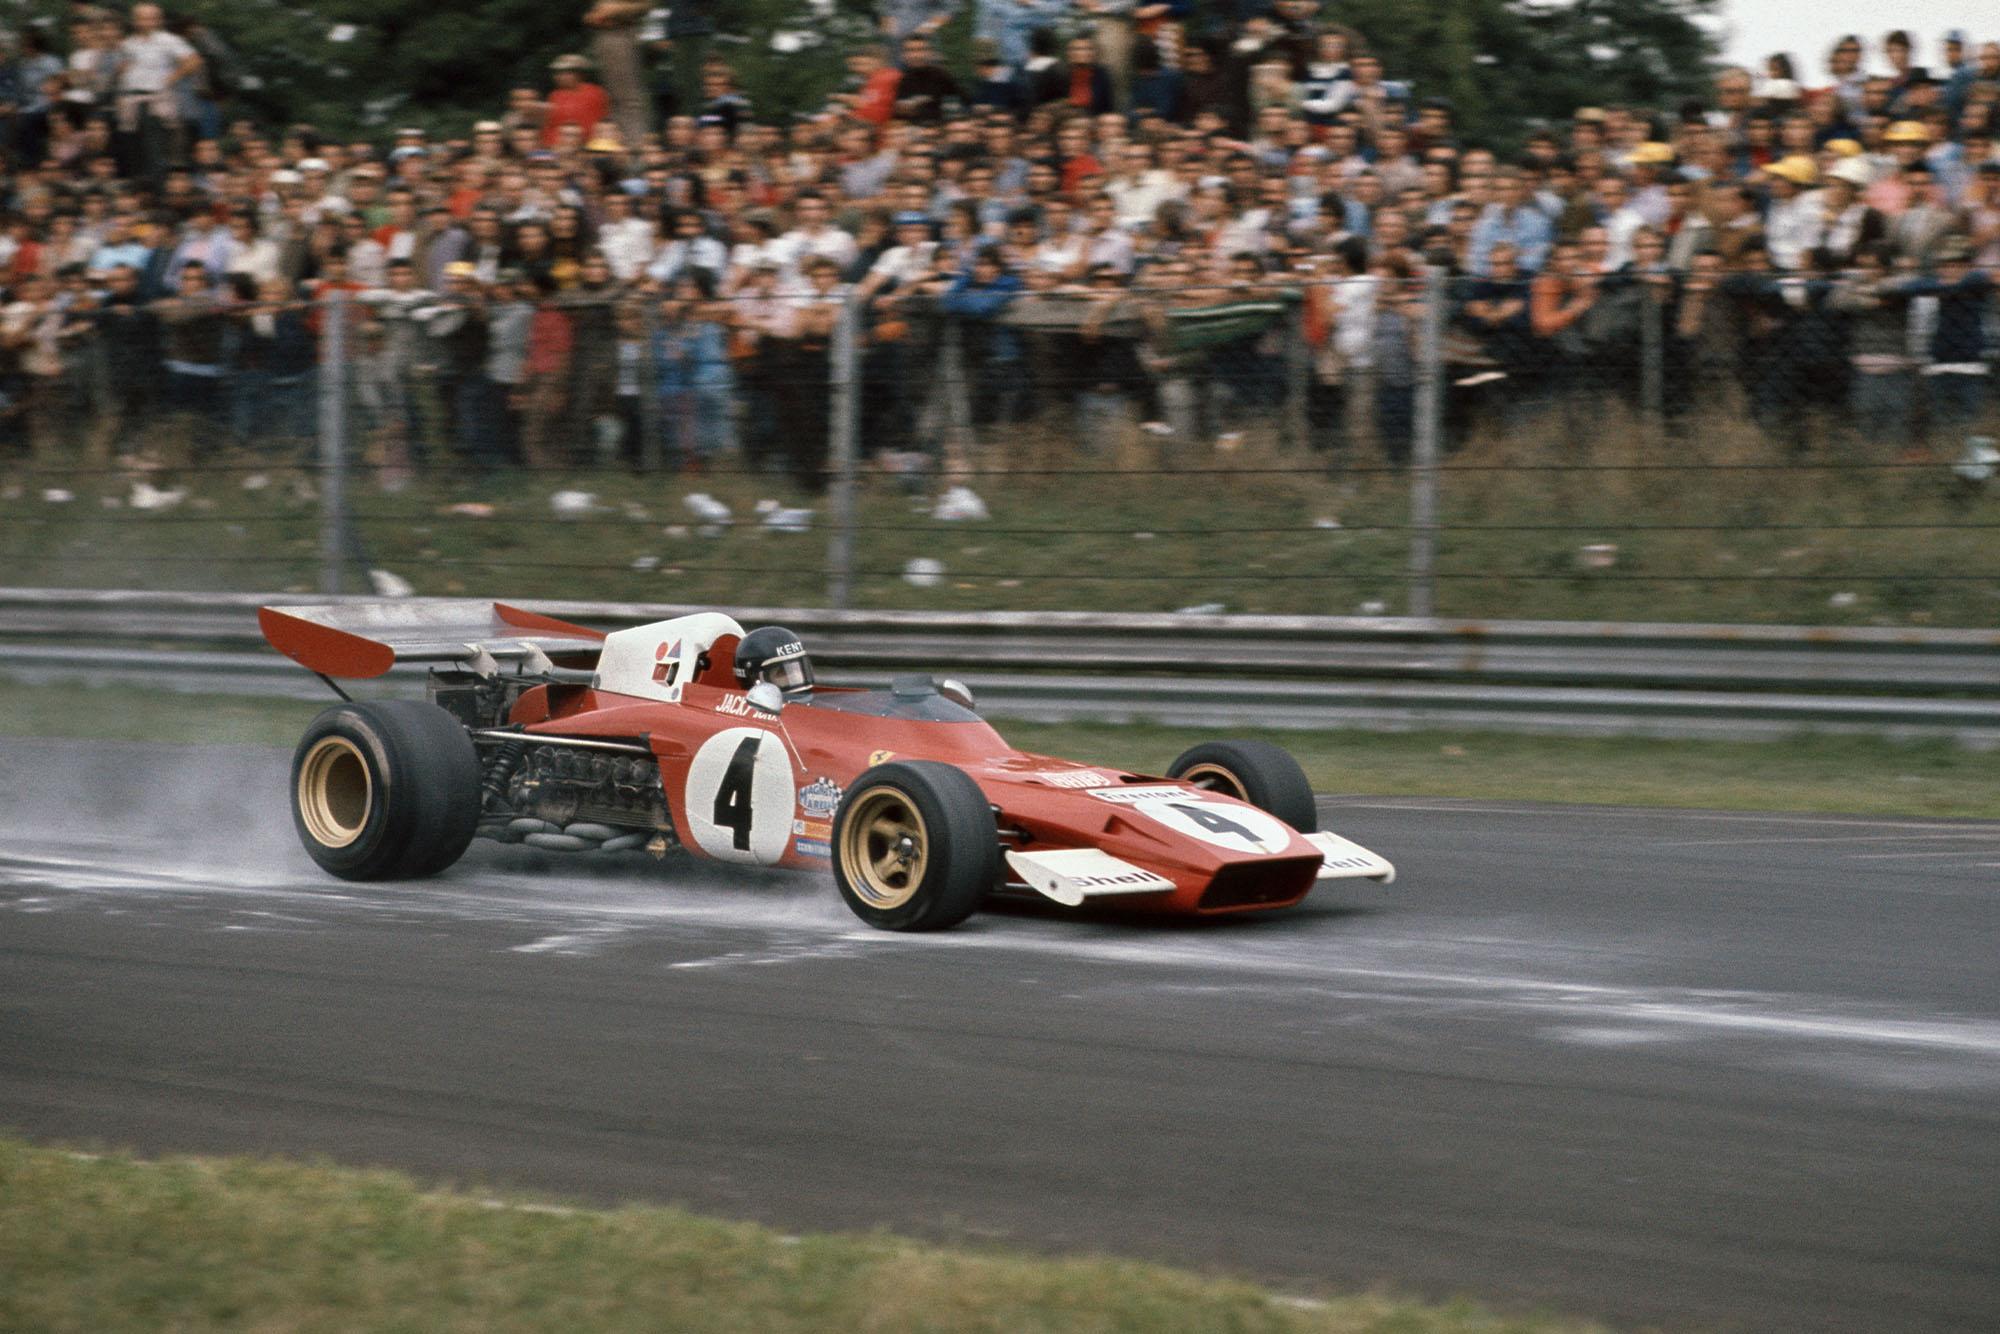 Ferrari's Jacky Ickx brakes for a corner during the 1972 Italian Grand Prix, Monza.